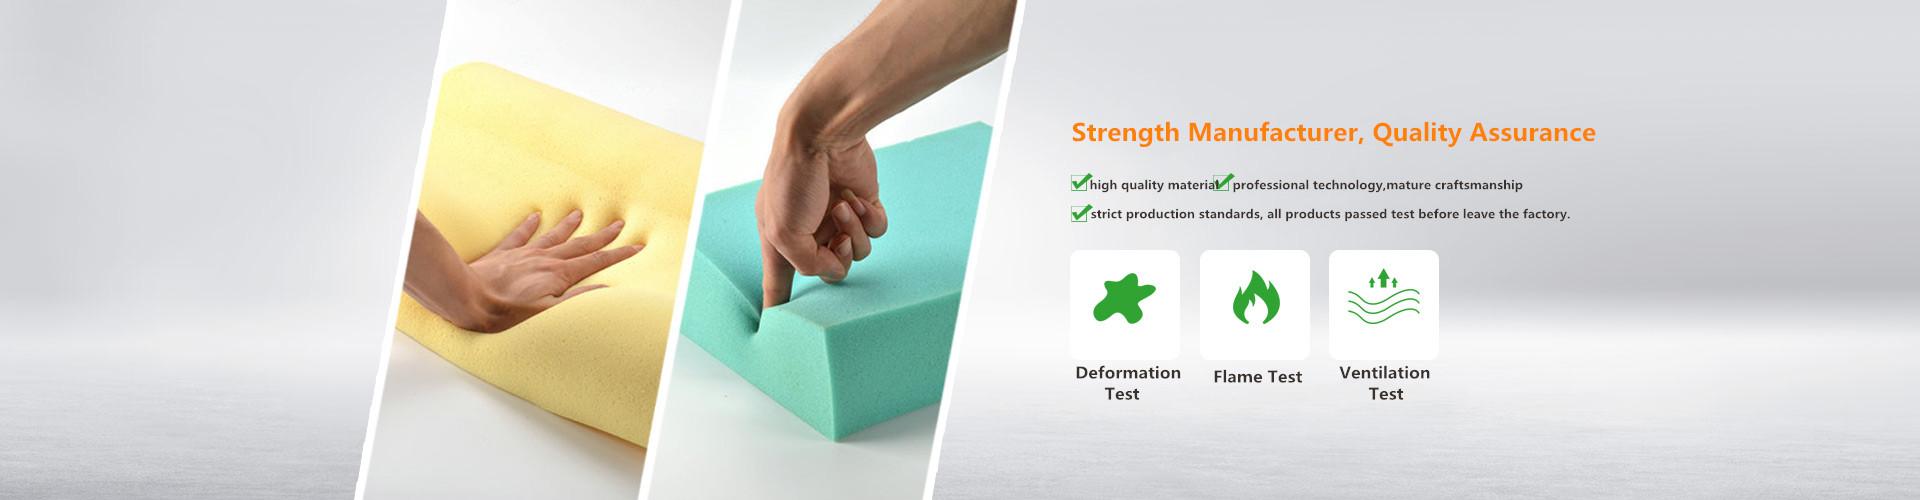 strength manufacturer